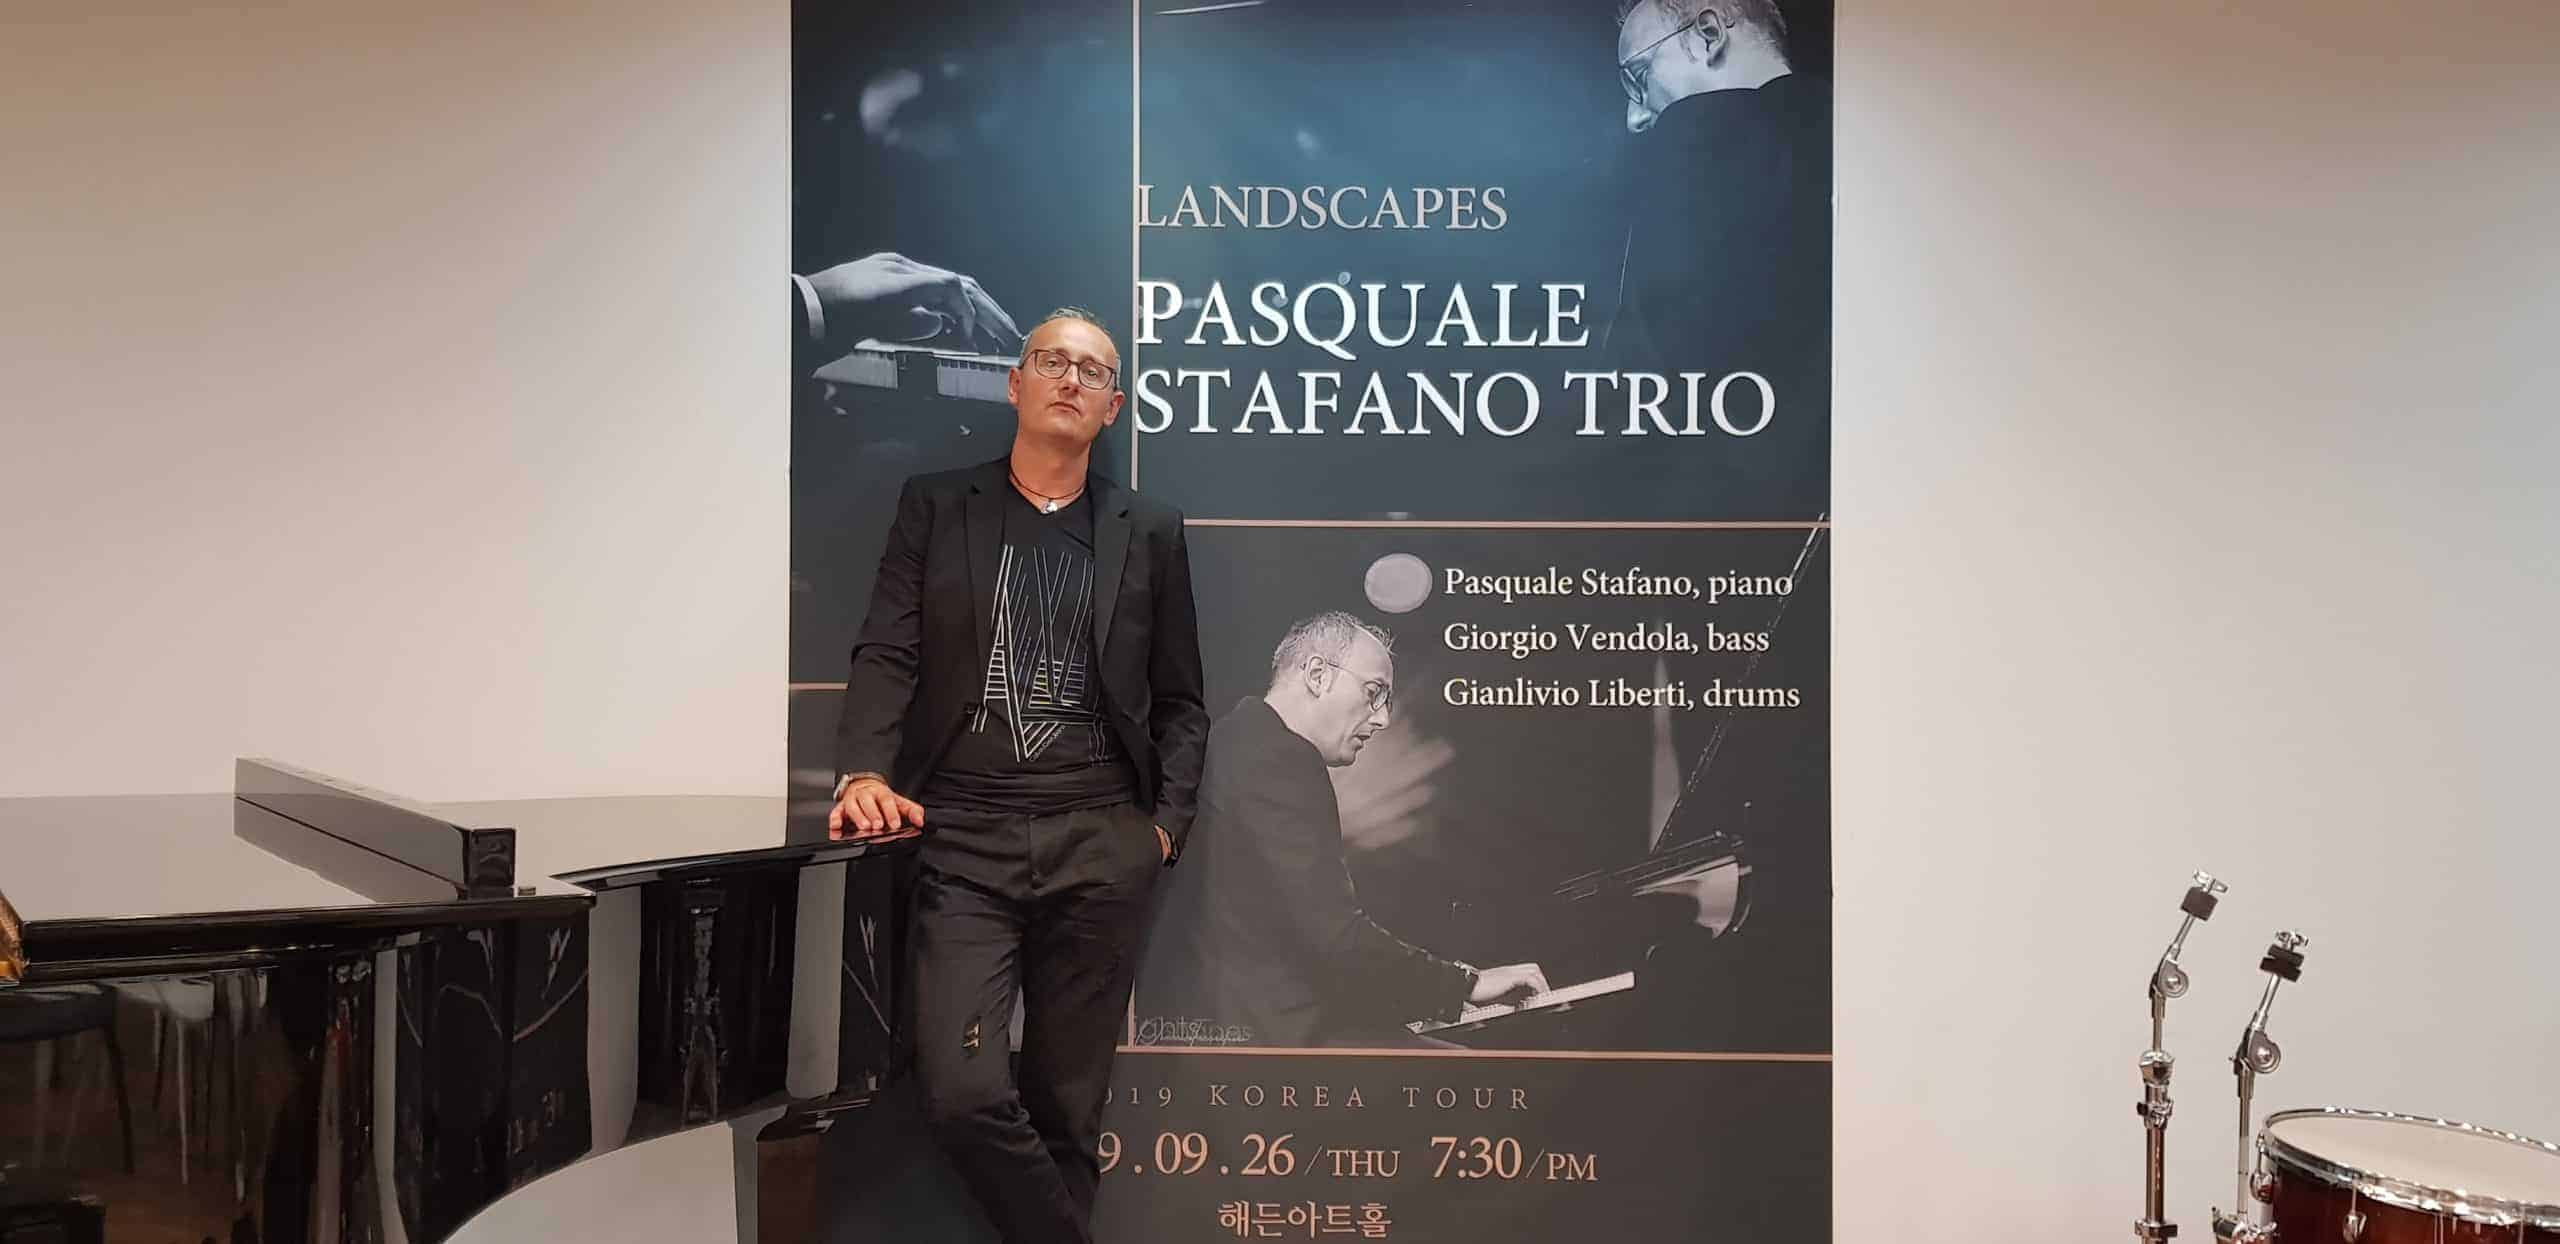 Pasquale Stafano